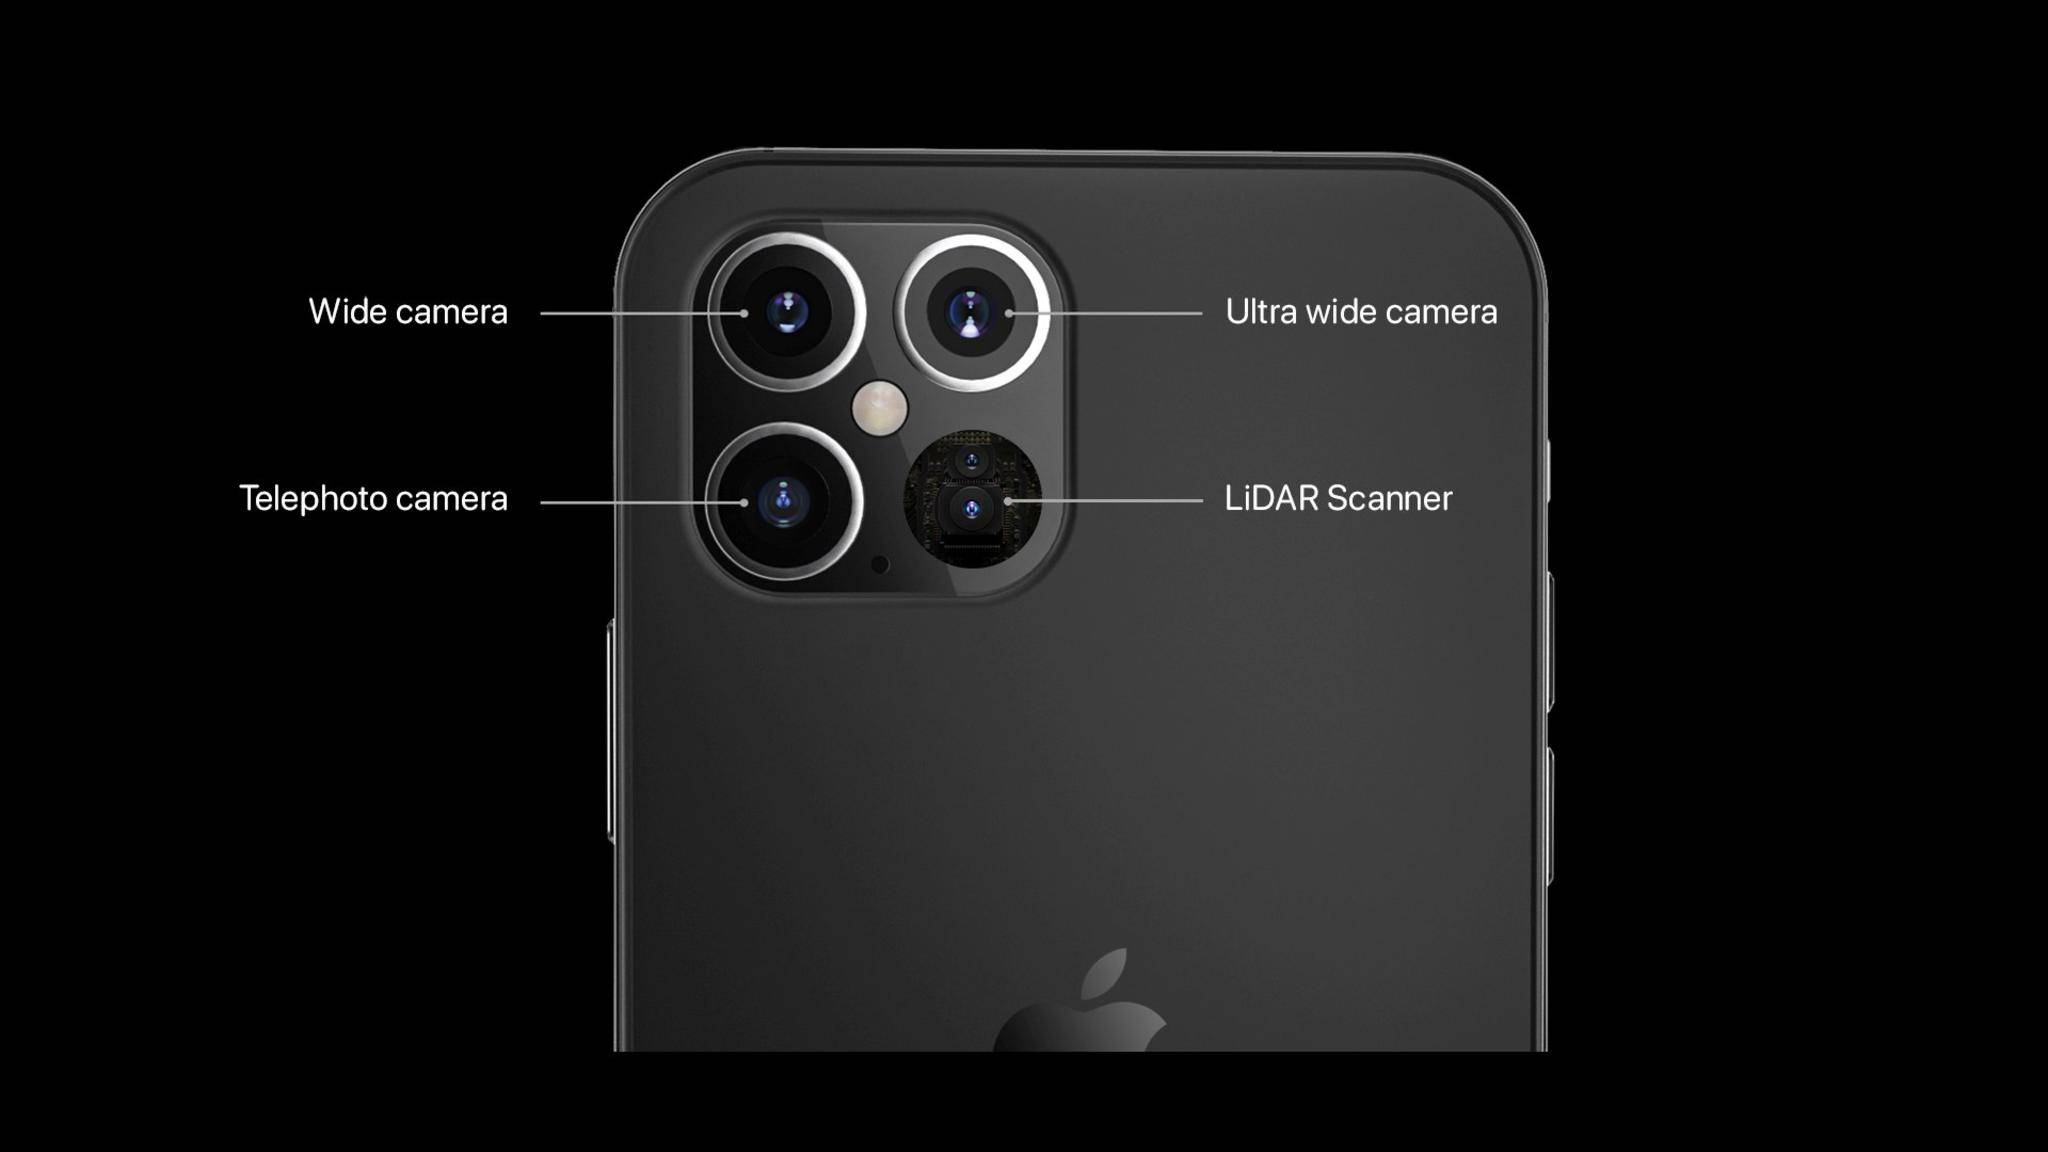 iPhone-12-LiDAR-scanner-explained